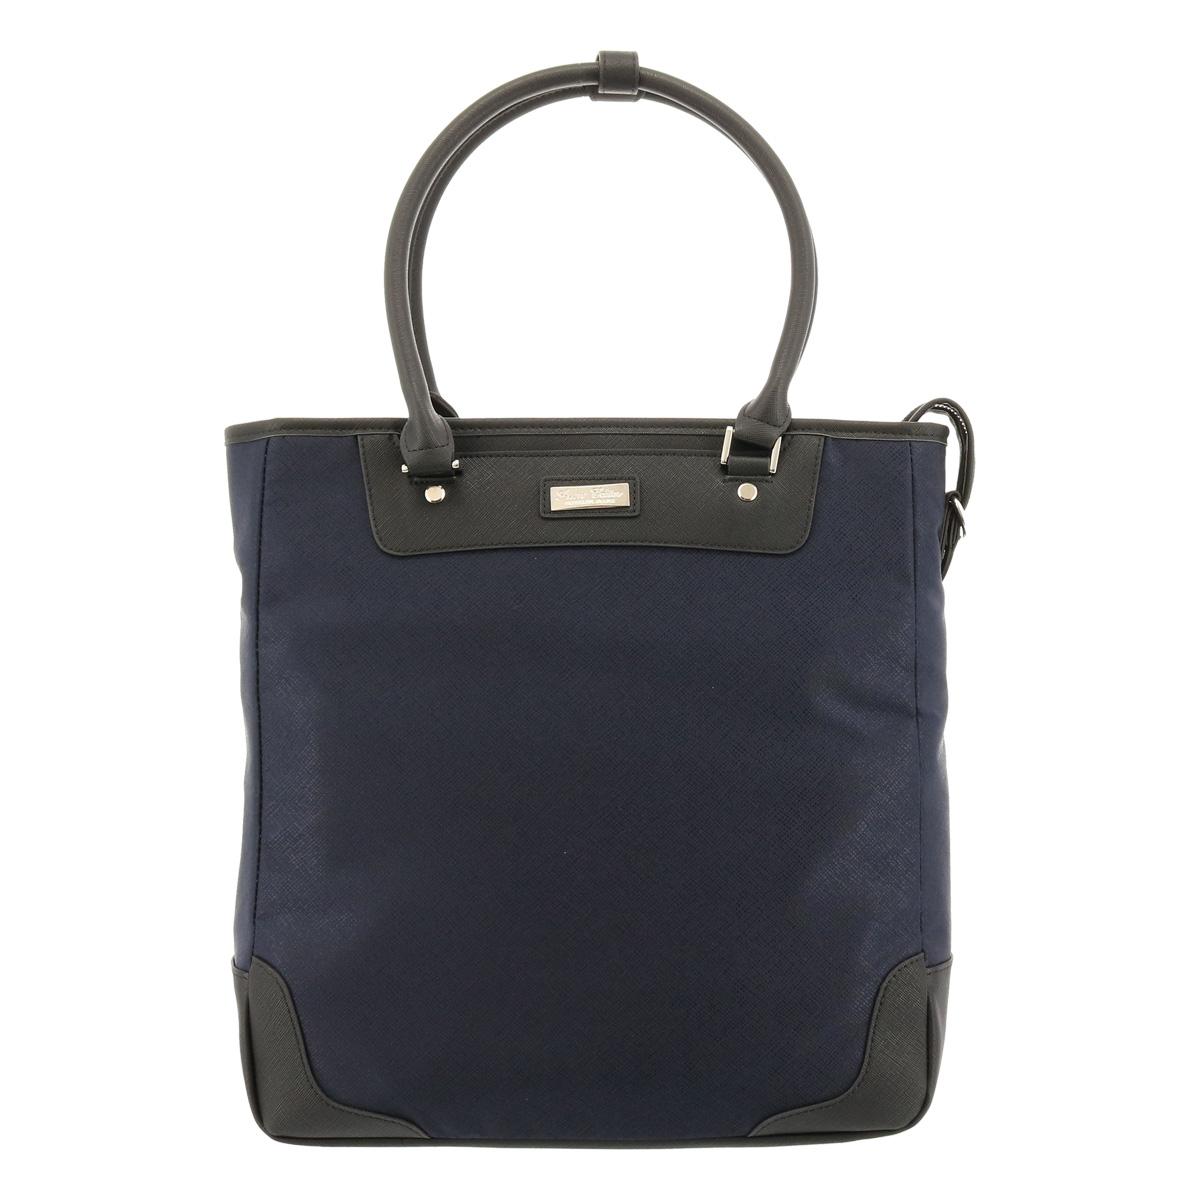 c37903034d07 ハイデザイン メンズ ショルダーバッグ バッグ Sierra Shoulder Bag with Sling Strap 49800!